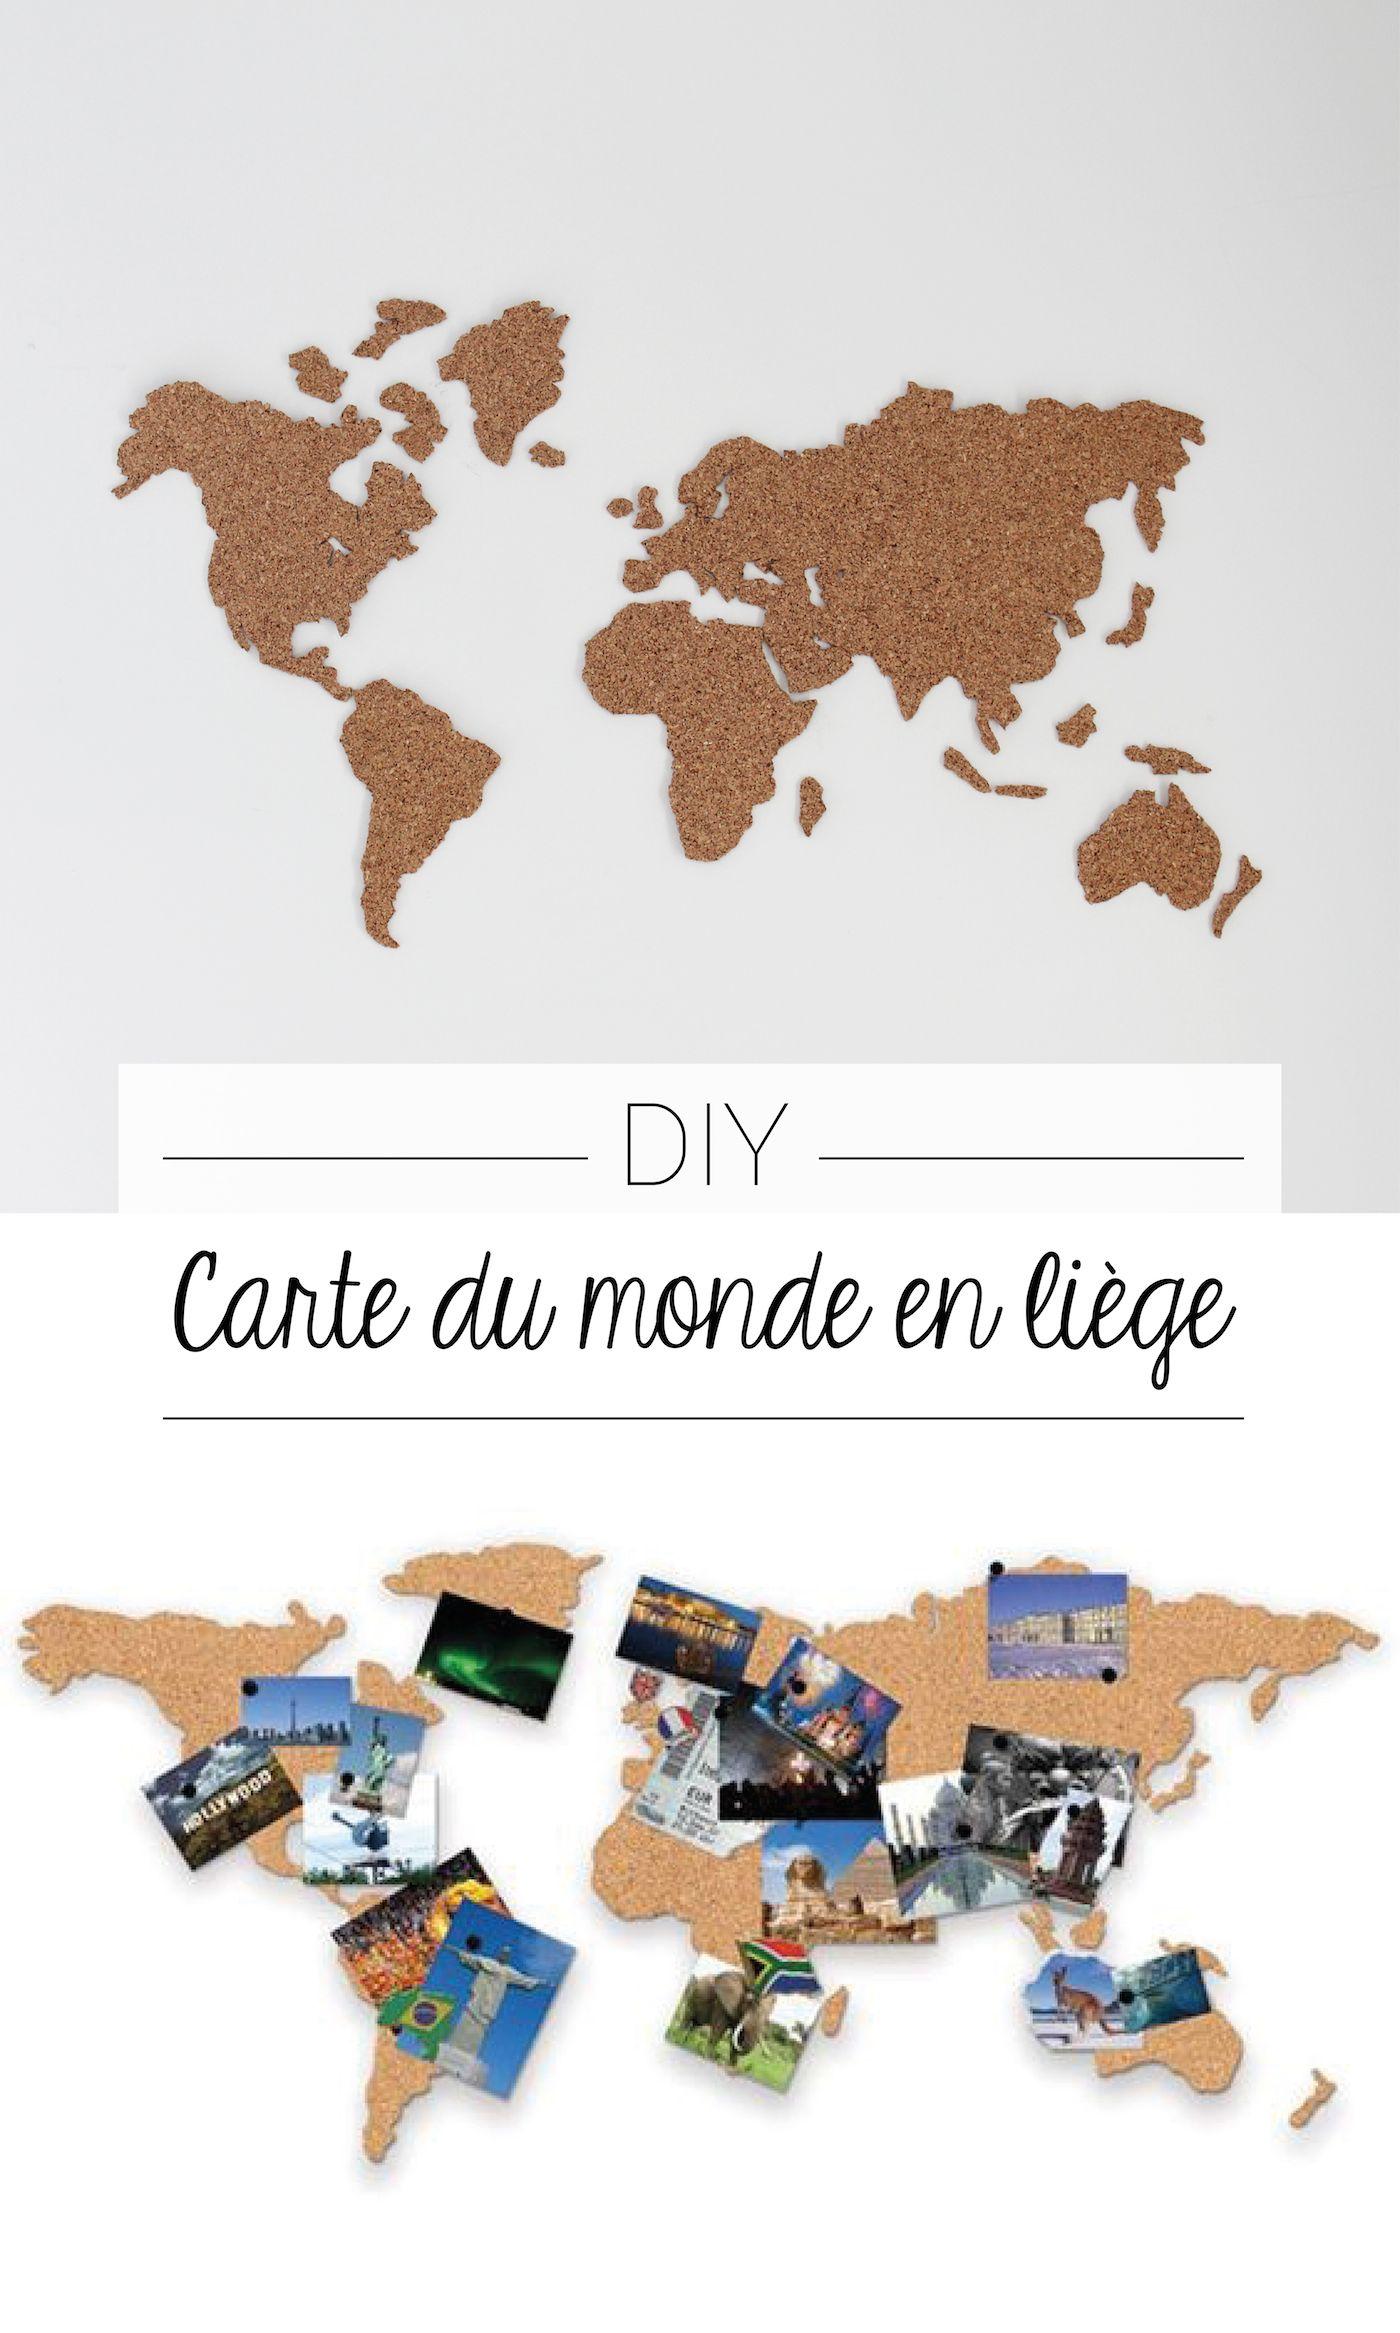 diy diy maison pinterest diy deco et carte du monde. Black Bedroom Furniture Sets. Home Design Ideas